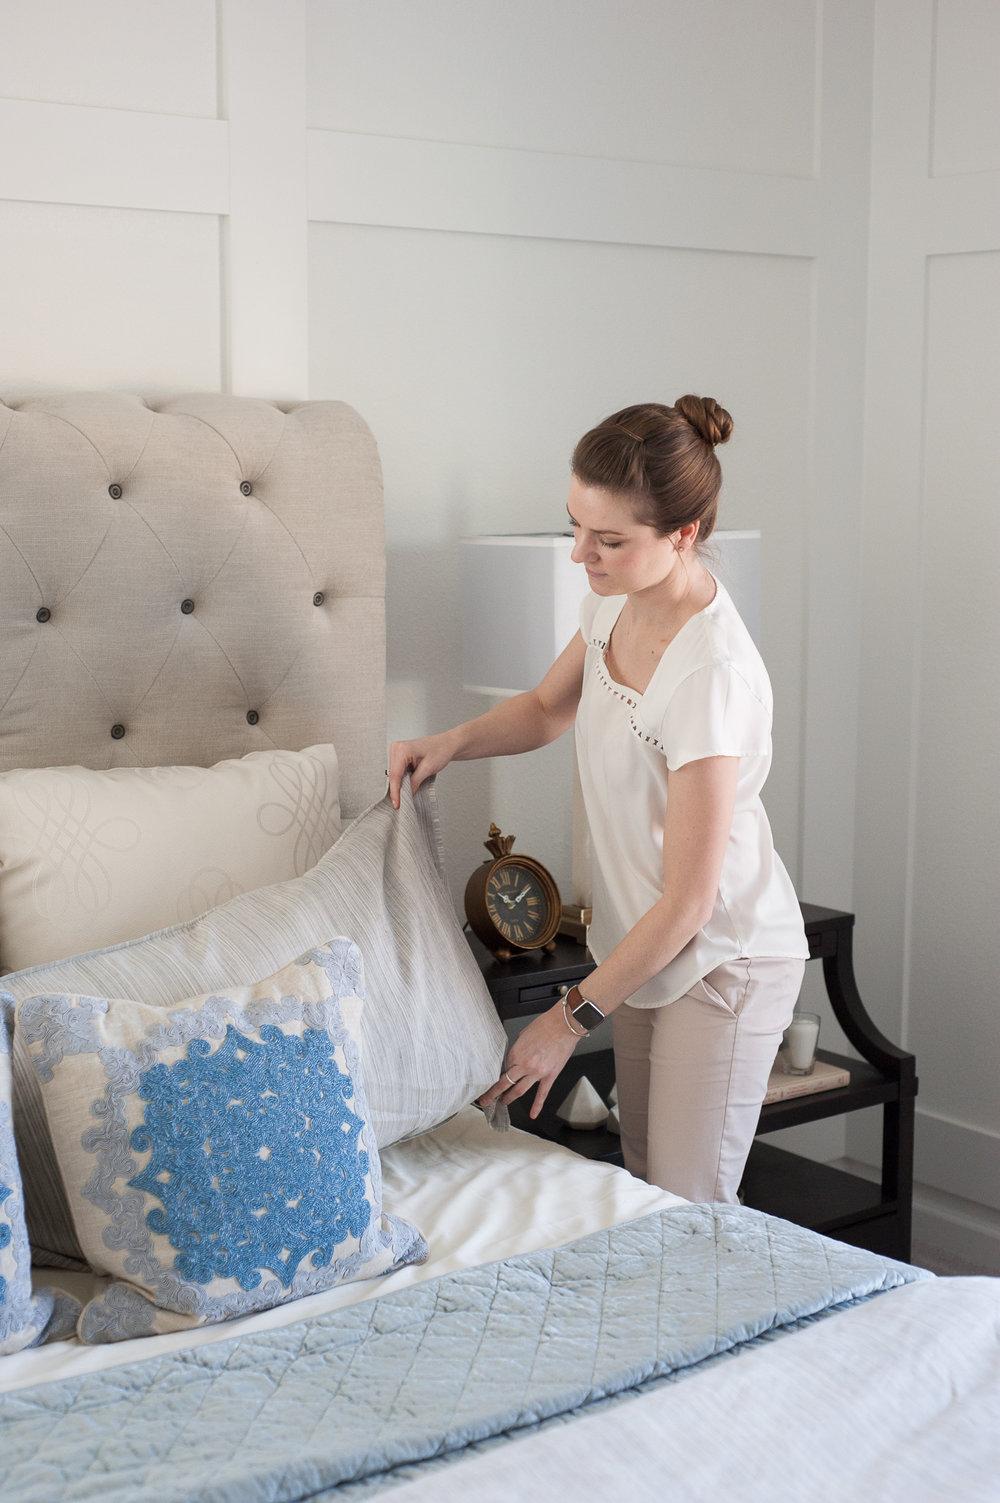 Micamy_Interior Designer_Design_Interior_Model_Merchandising_Owners_Suite_Universal_Furniture_Traditional_Transitional_Bedroom_Styling_Blogger_Ann_Taylor_Bedding.jpg